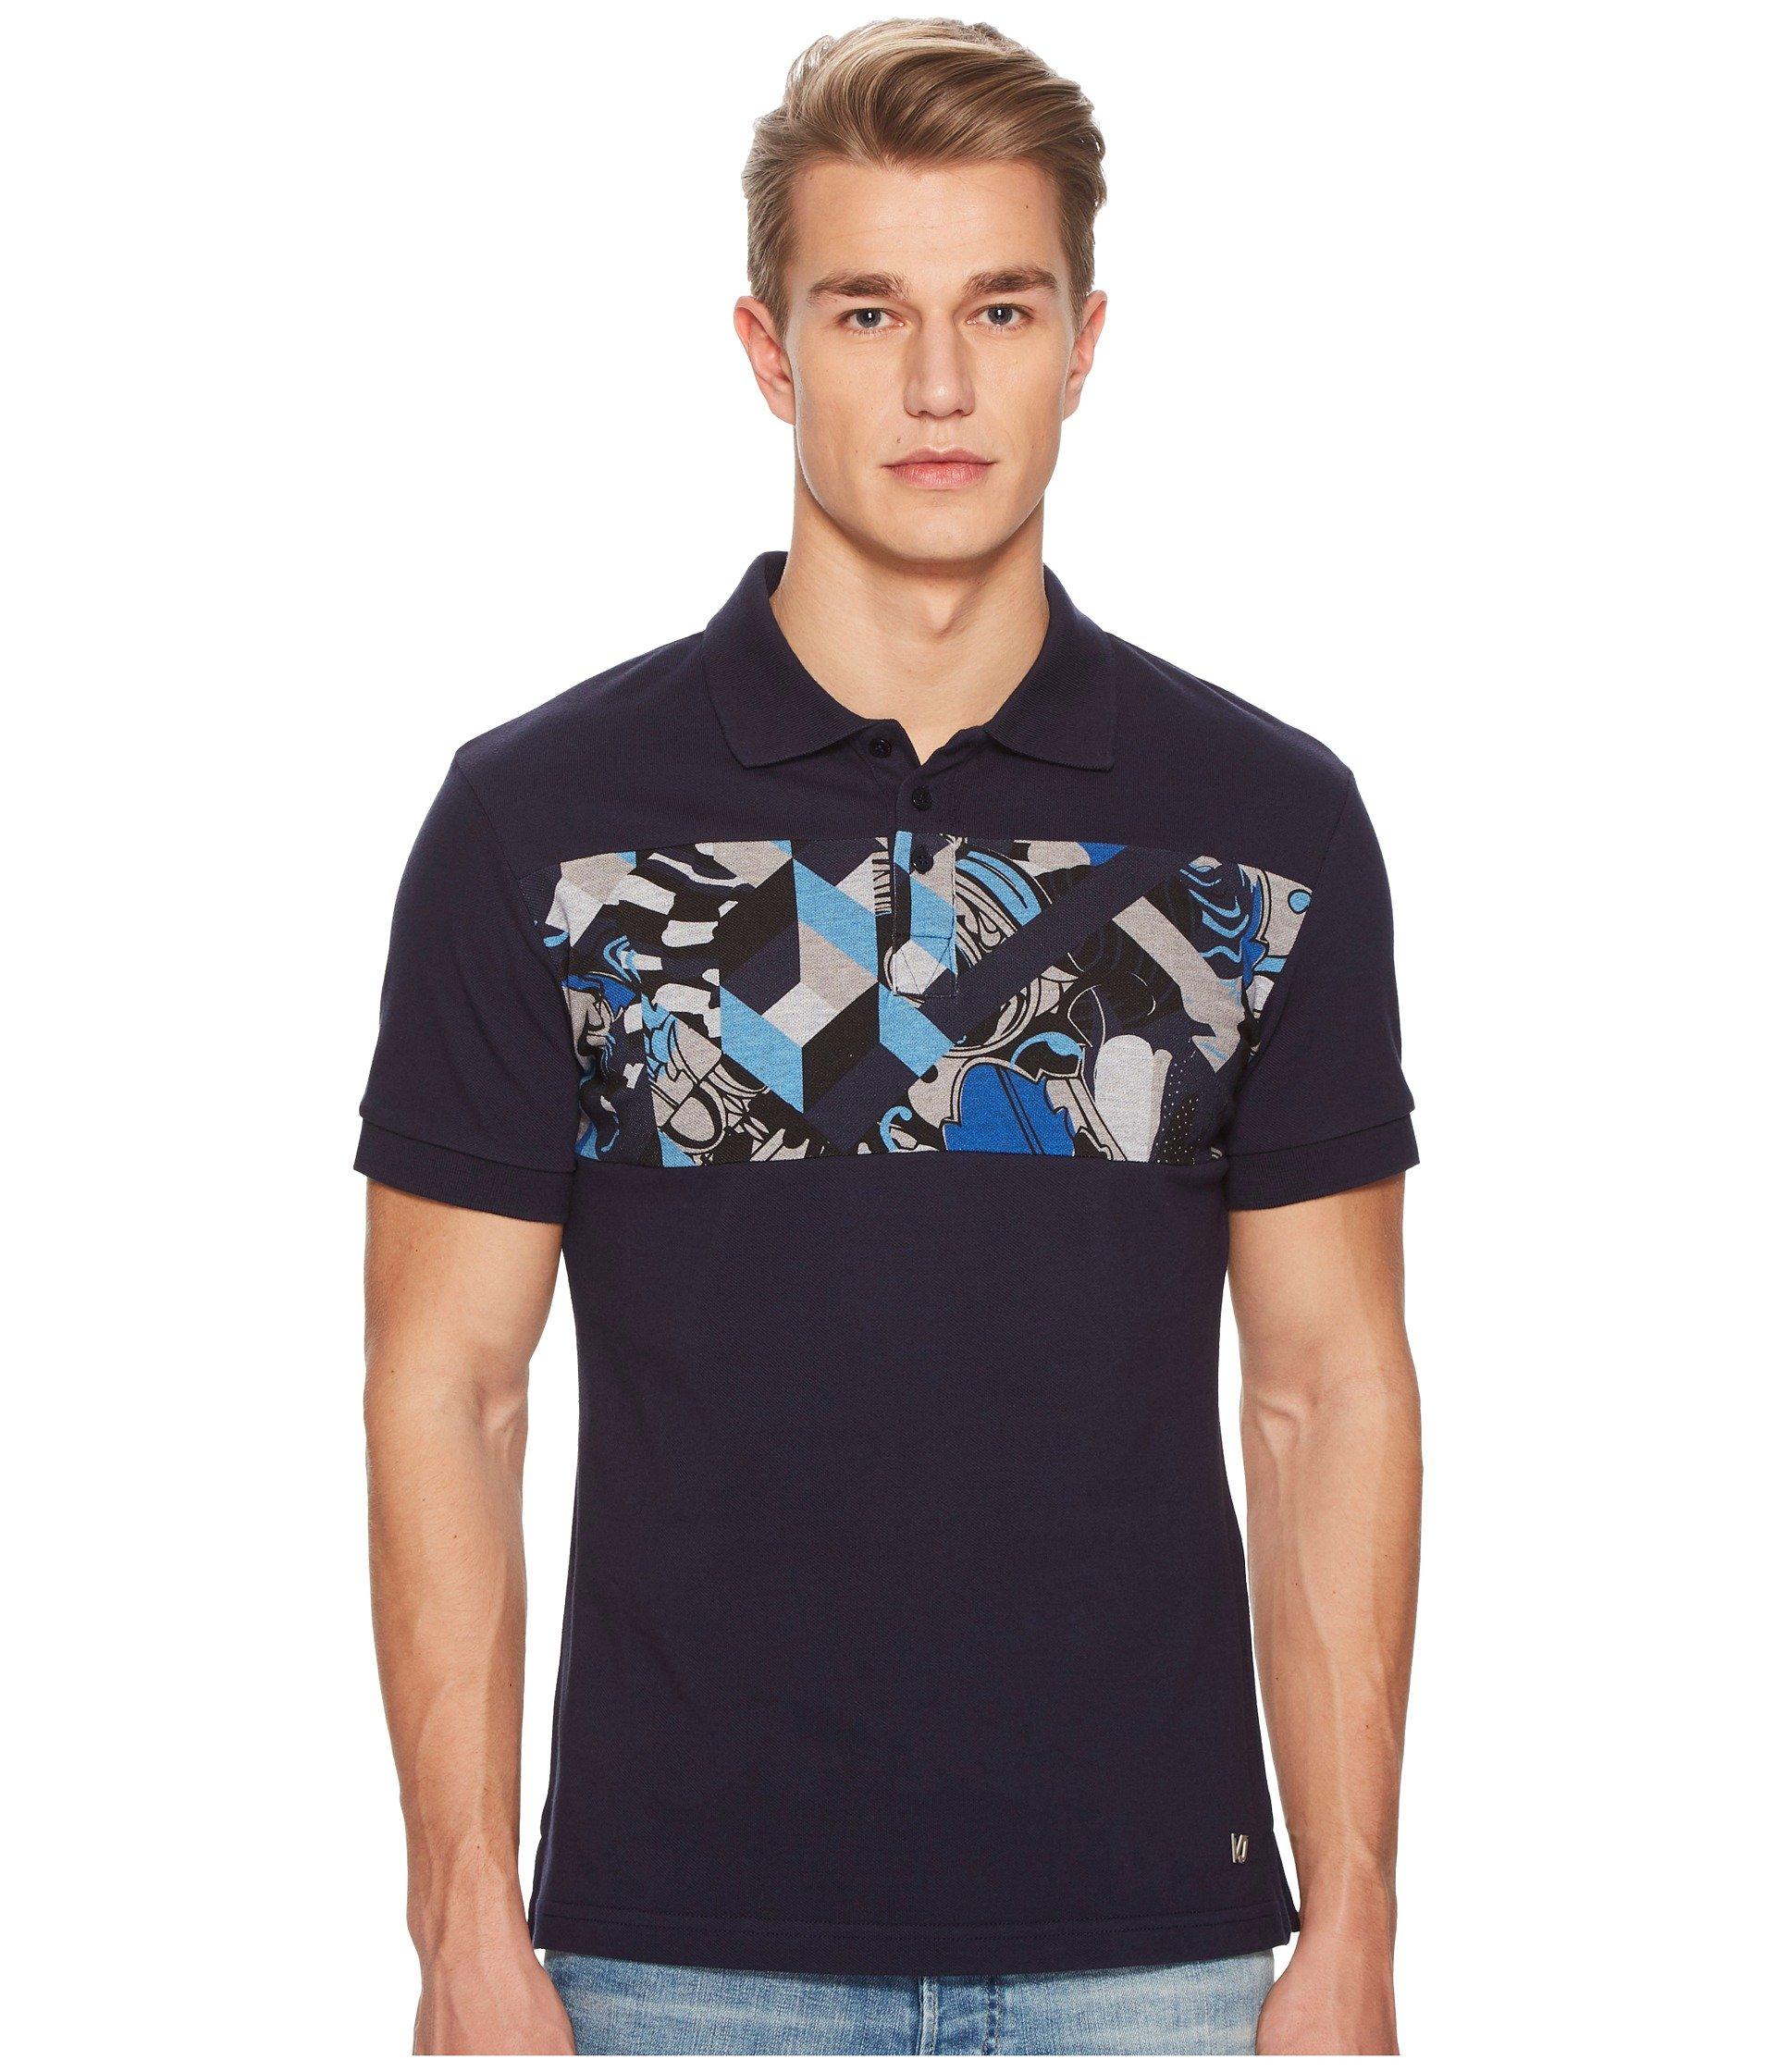 Camiseta Tipo Polo para Hombre Versace Jeans Graphic Block Stripe Polo  + Versace en VeoyCompro.net